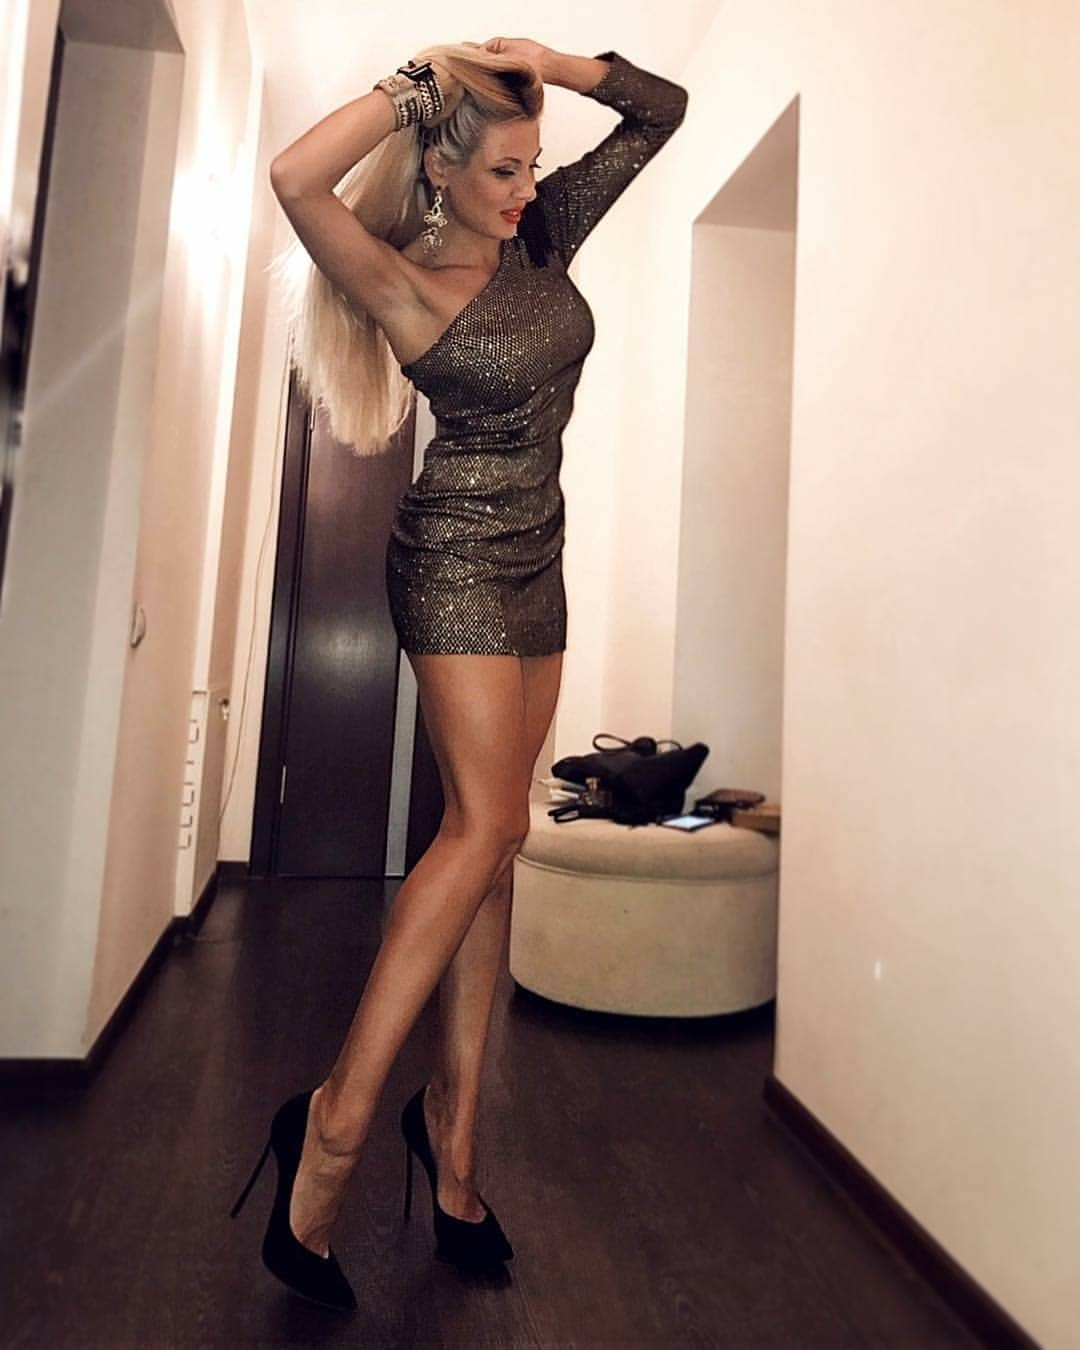 Long Legs Babes on high heels ab tight dress - Webcam